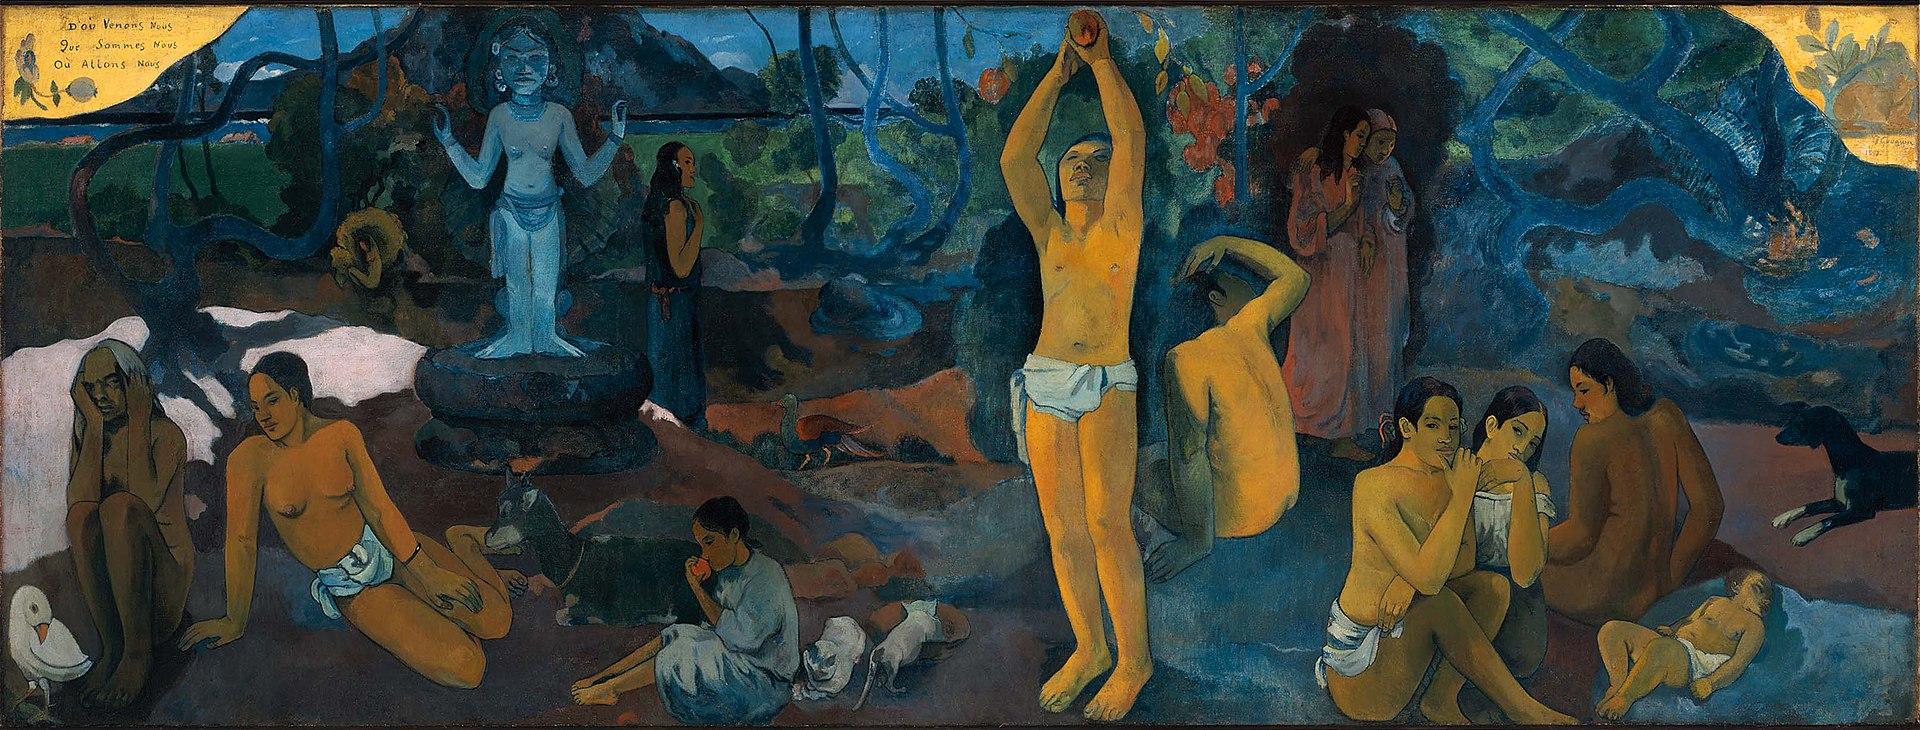 Gauguin001.jpg